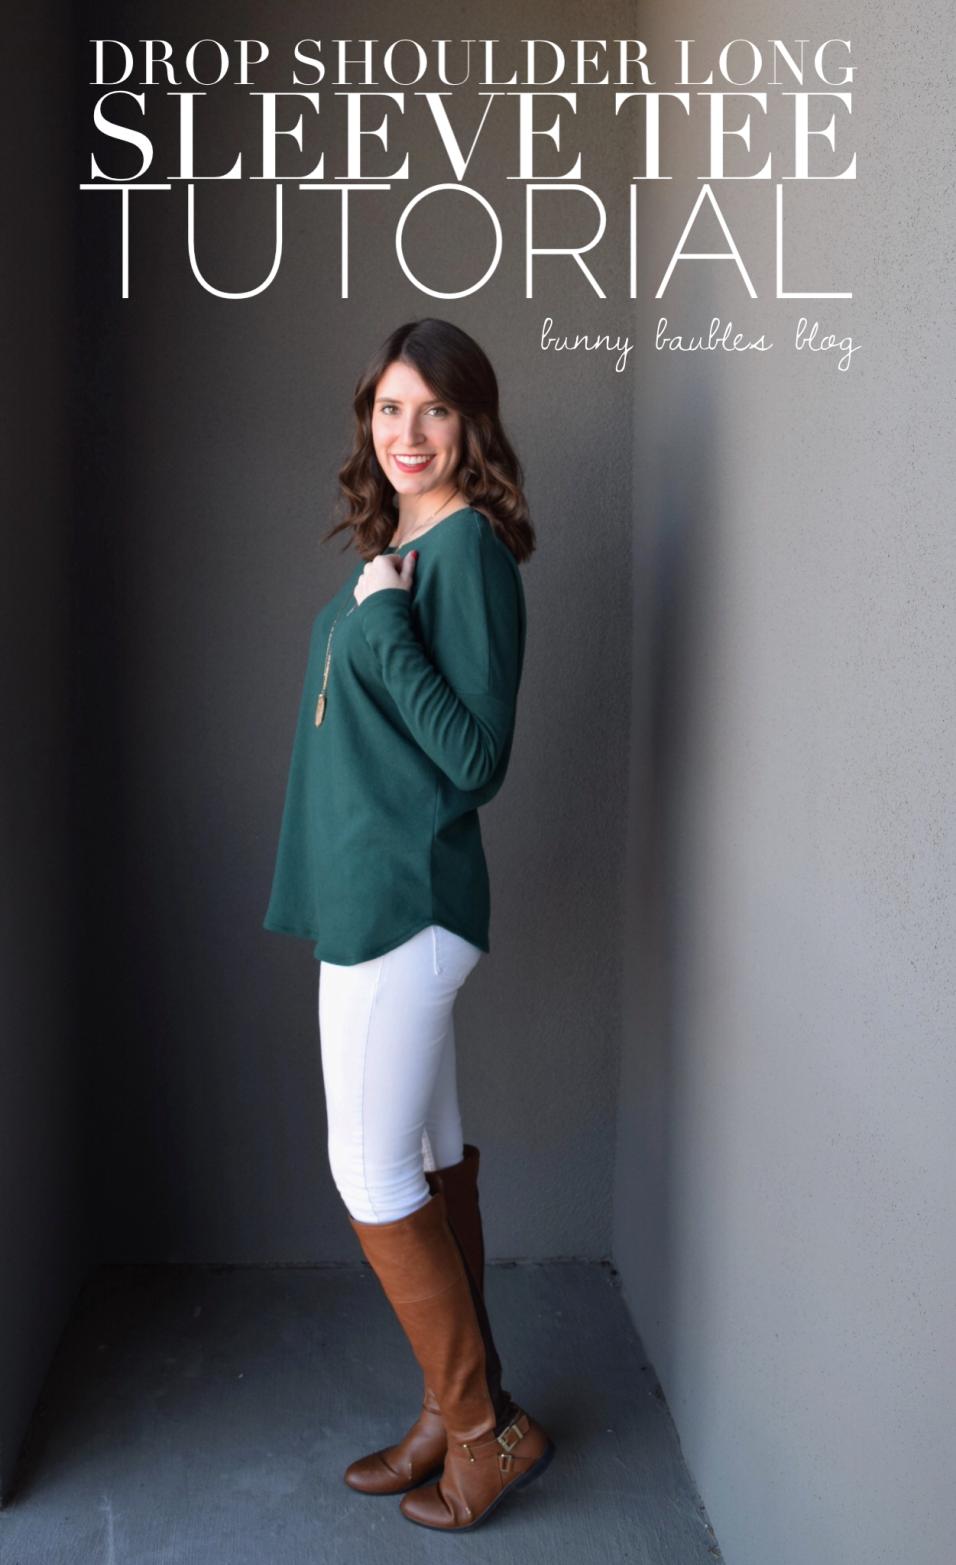 Drop Shoulder Long Sleeve Tee Tutorial by Bunny Baubles